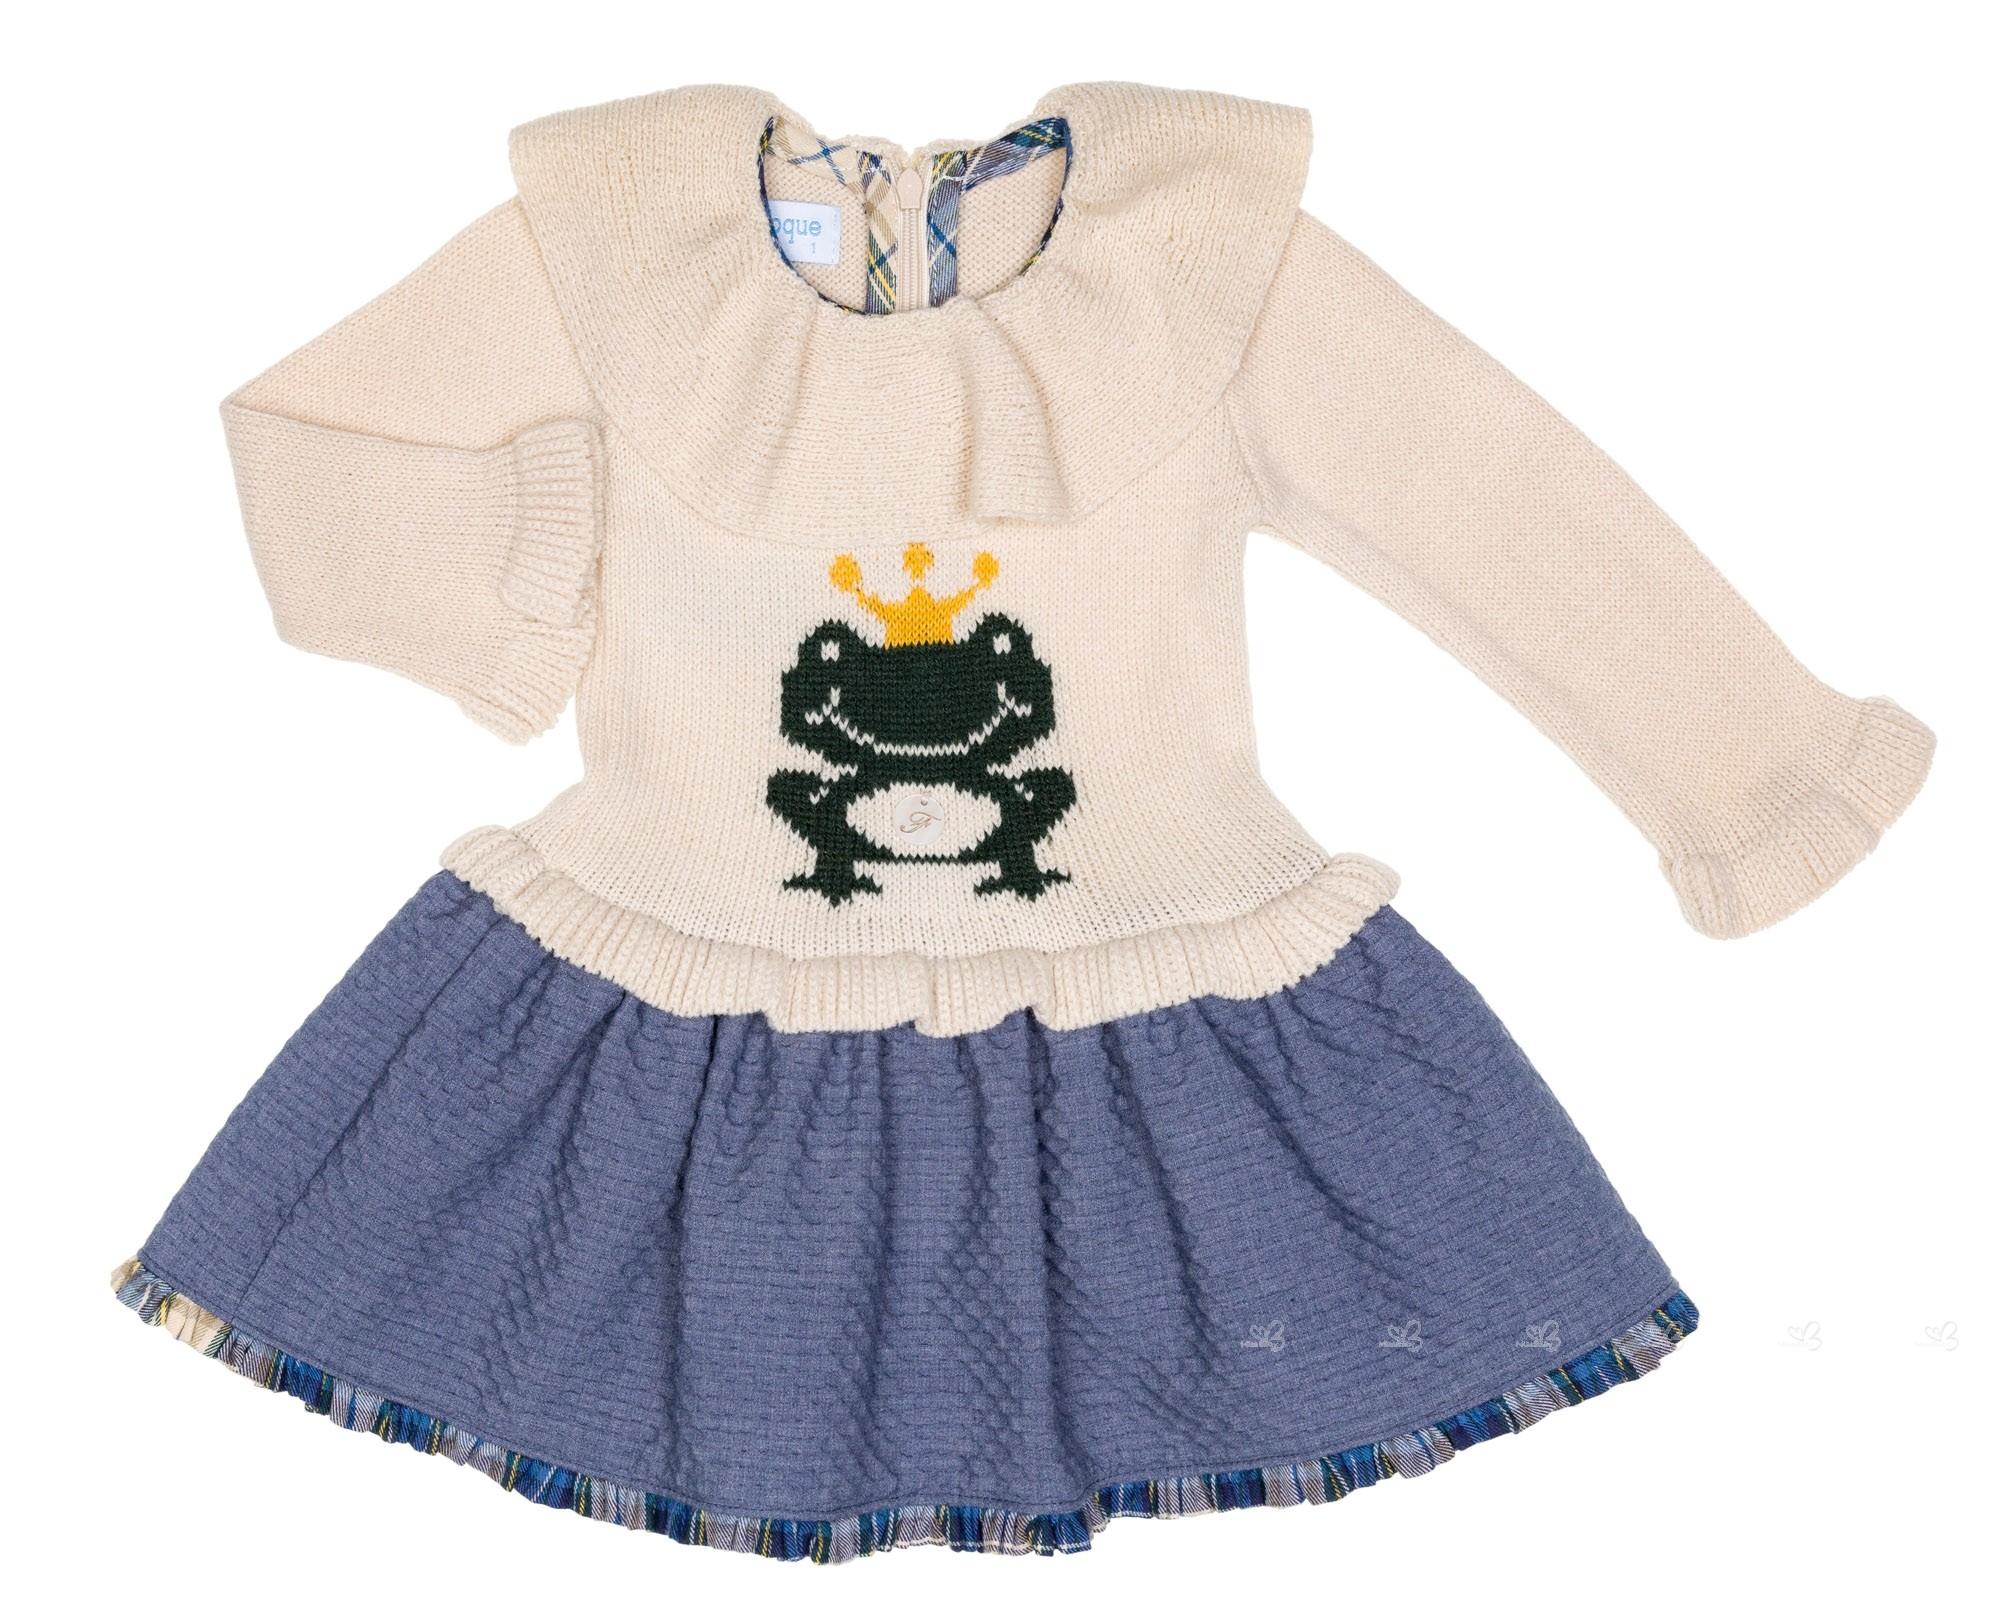 Beige Dress Picture Collection: Girls Beige & Blue Frog Dress